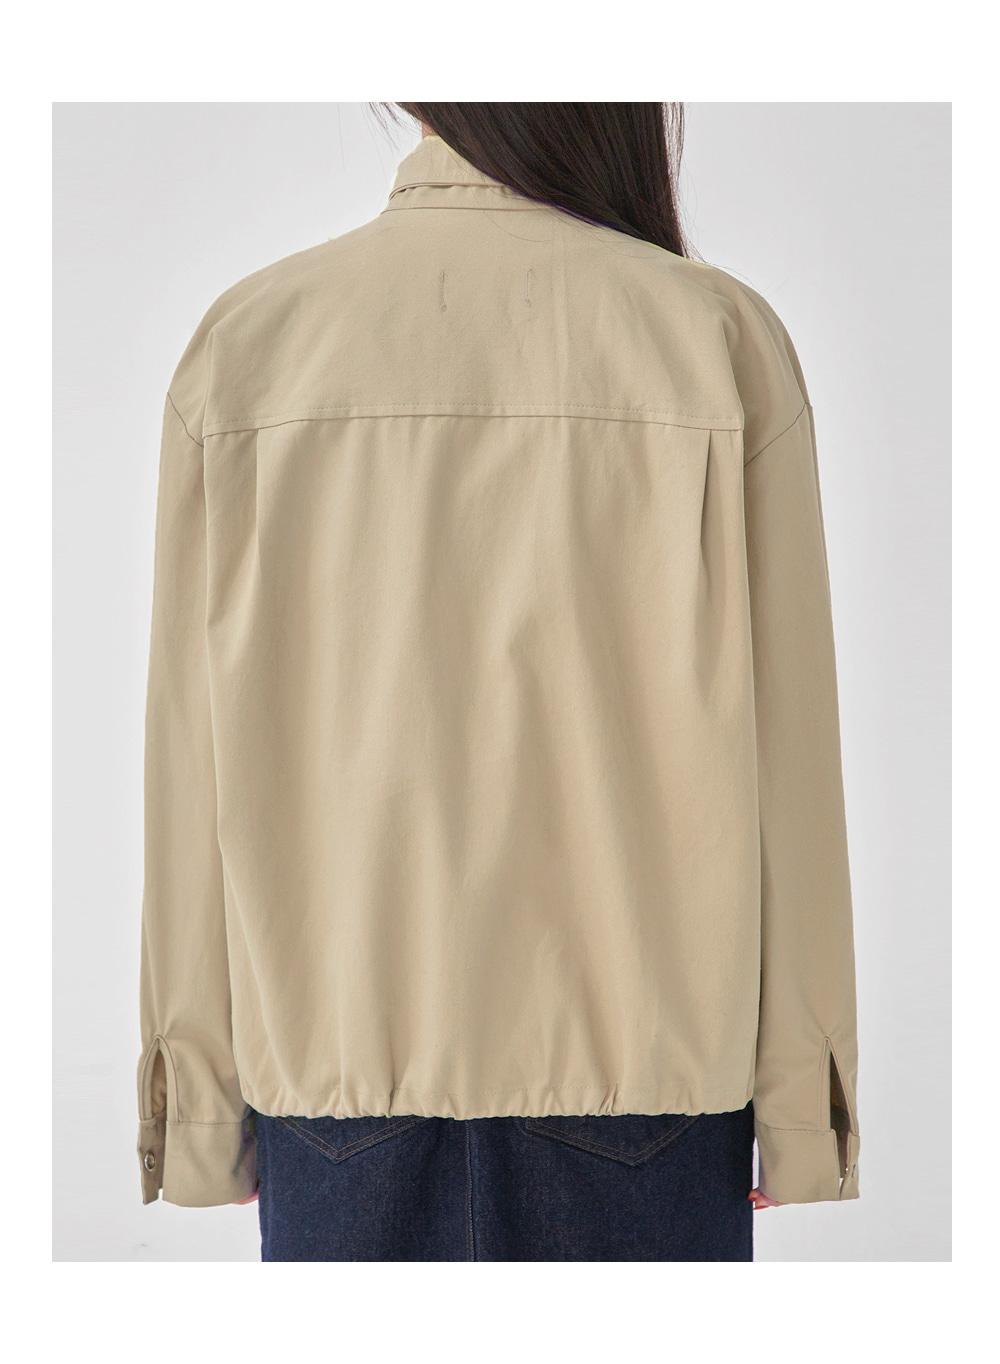 low short blouson jumper